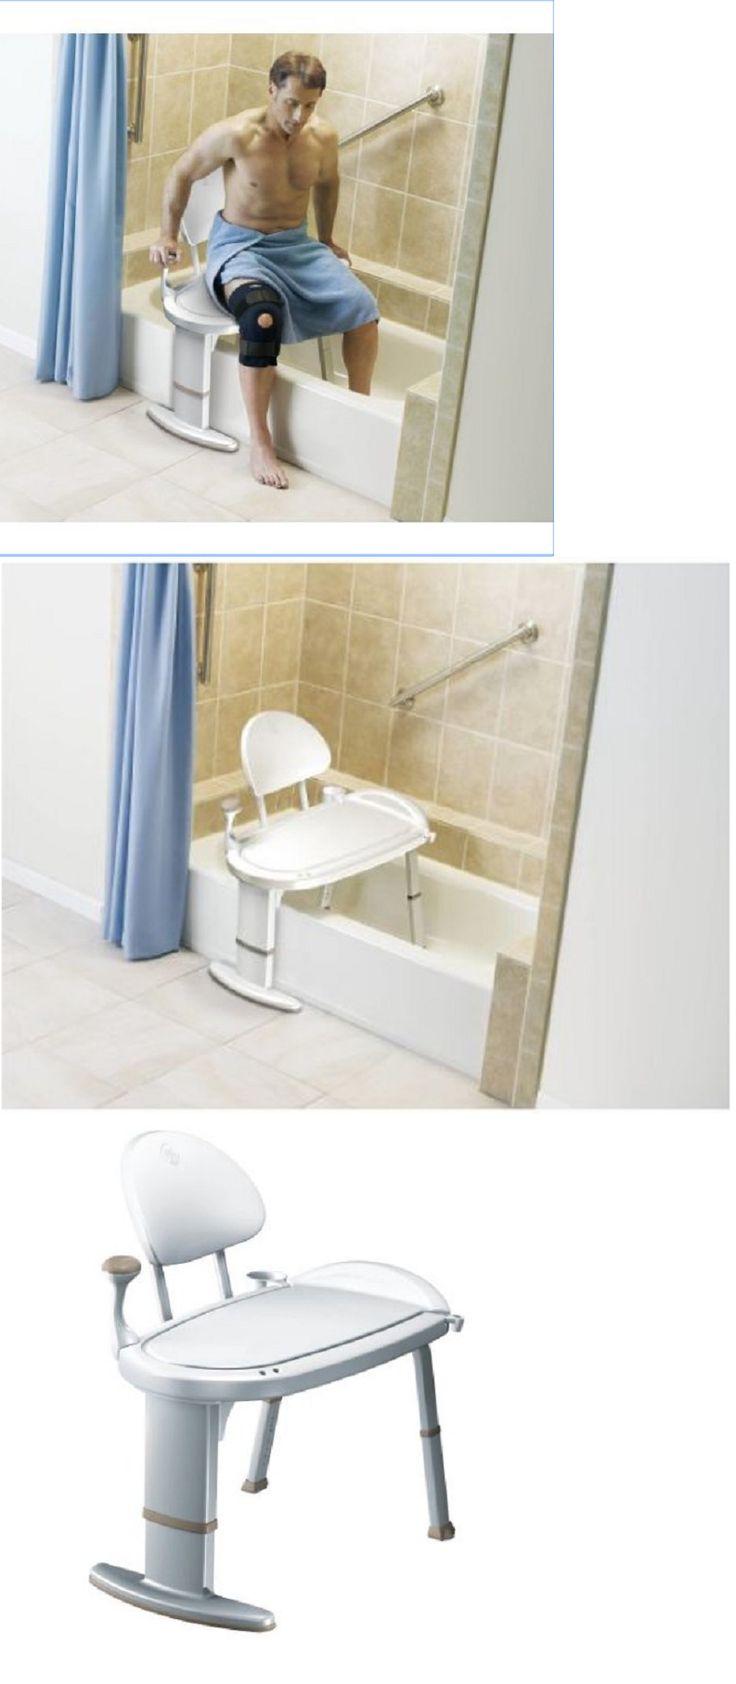 Great Paint Bathtub Thin Paint For Bathtub Flat Bath Tub Paint Painting Bathtub Youthful Bathtub Refinishers Soft Paint Tub